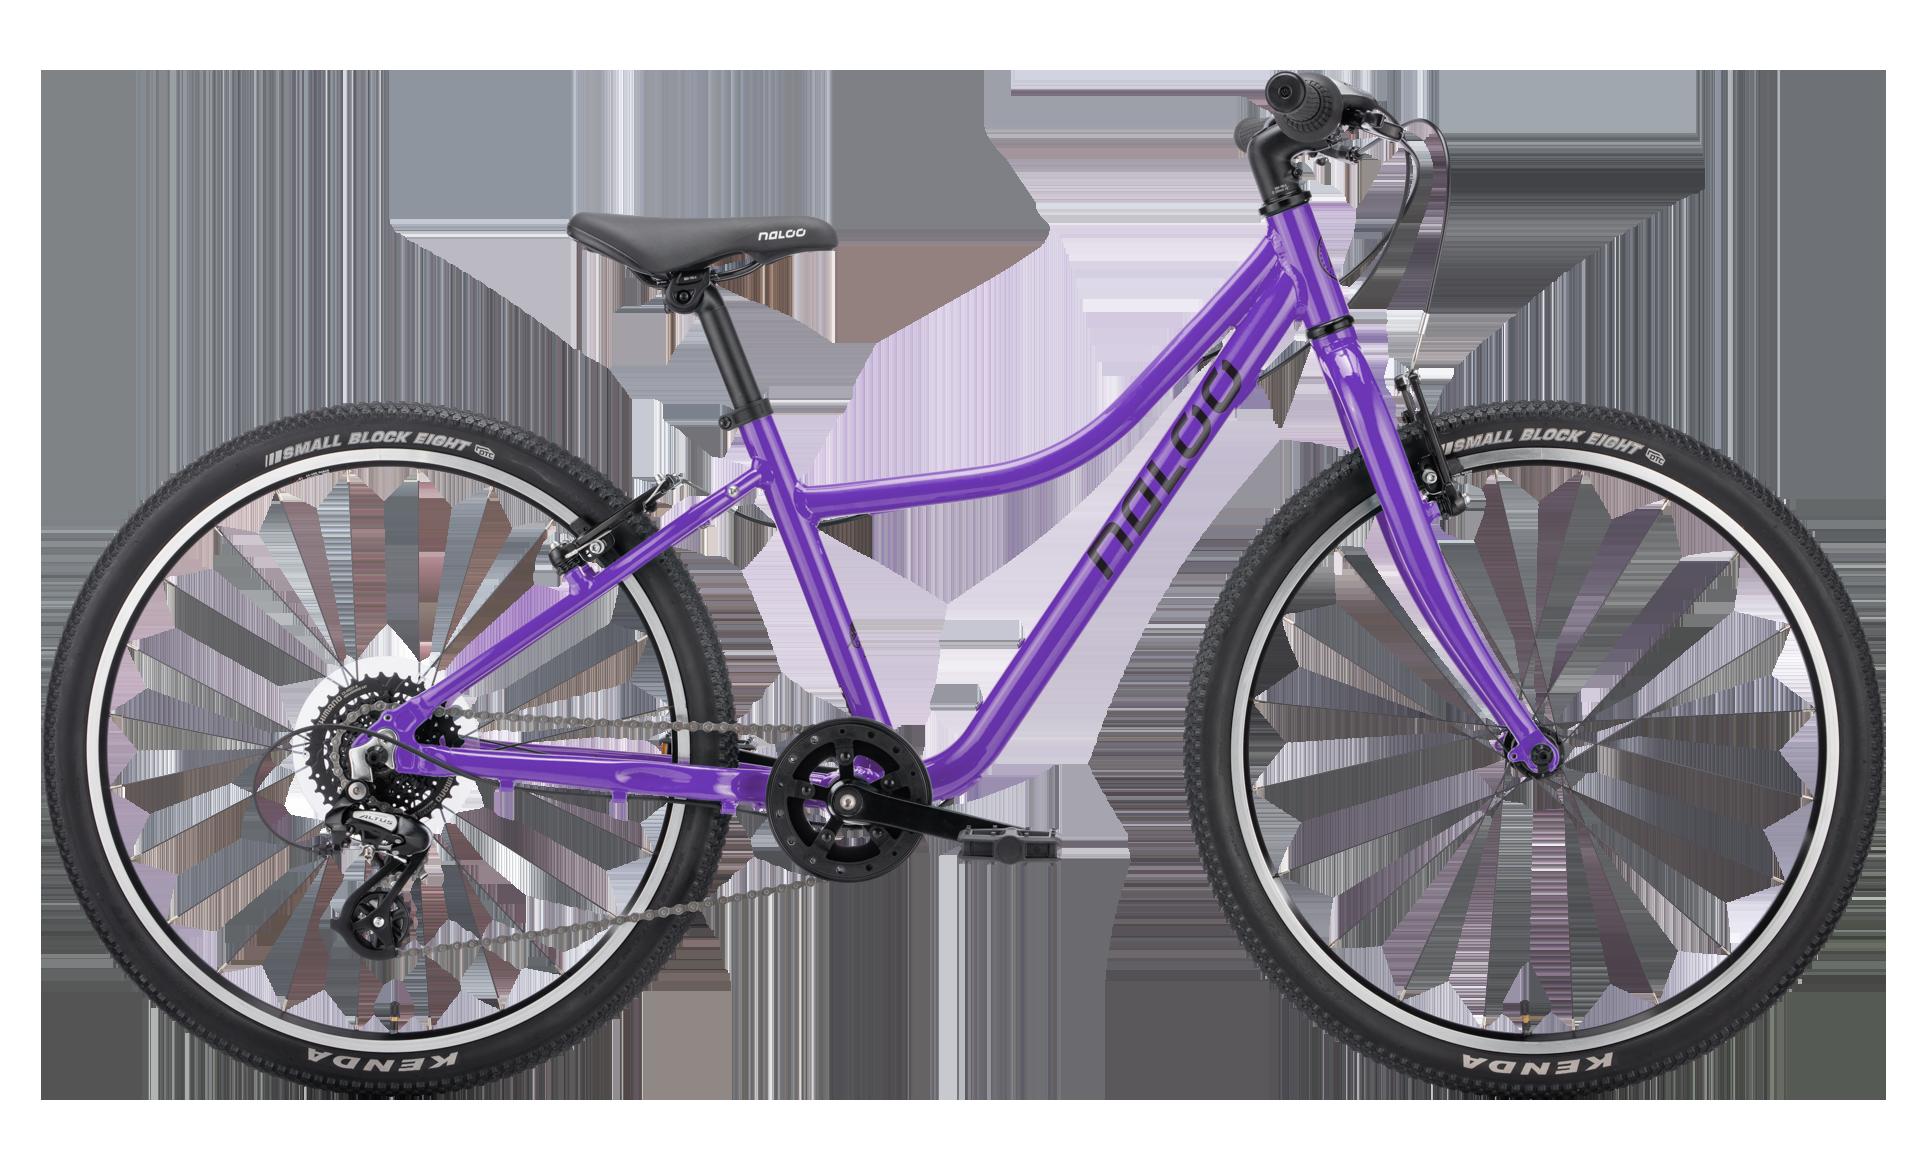 naloo_chameleon_mk2_24_purple.png